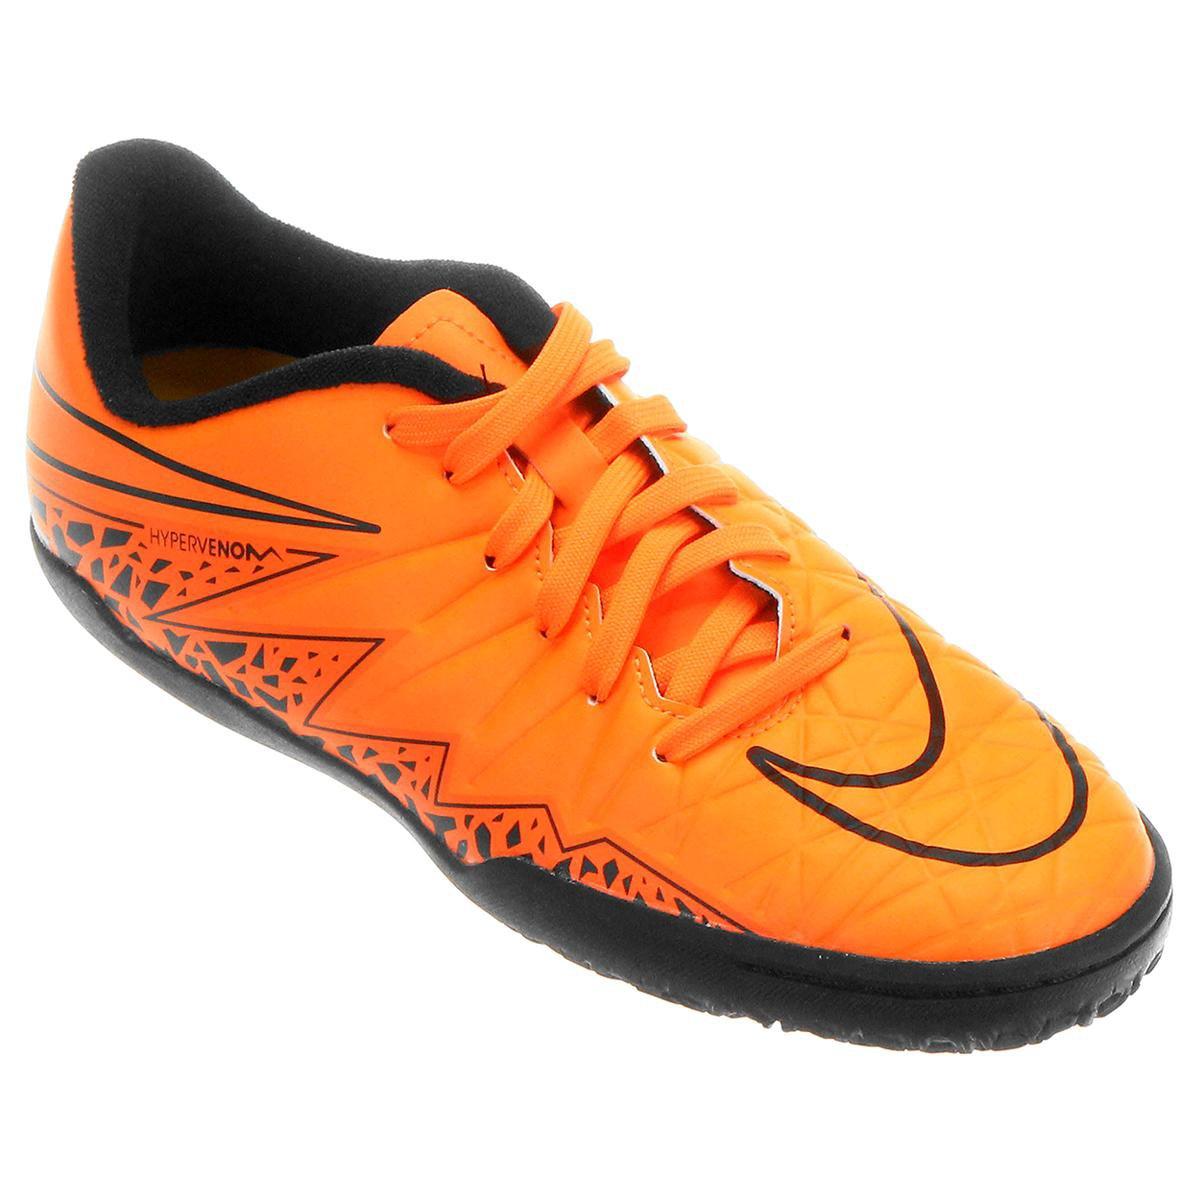 87df01c42e ... get o produto chuteira futsal infantil nike hypervenom phelon 2 ic  laranja e preto acabou.